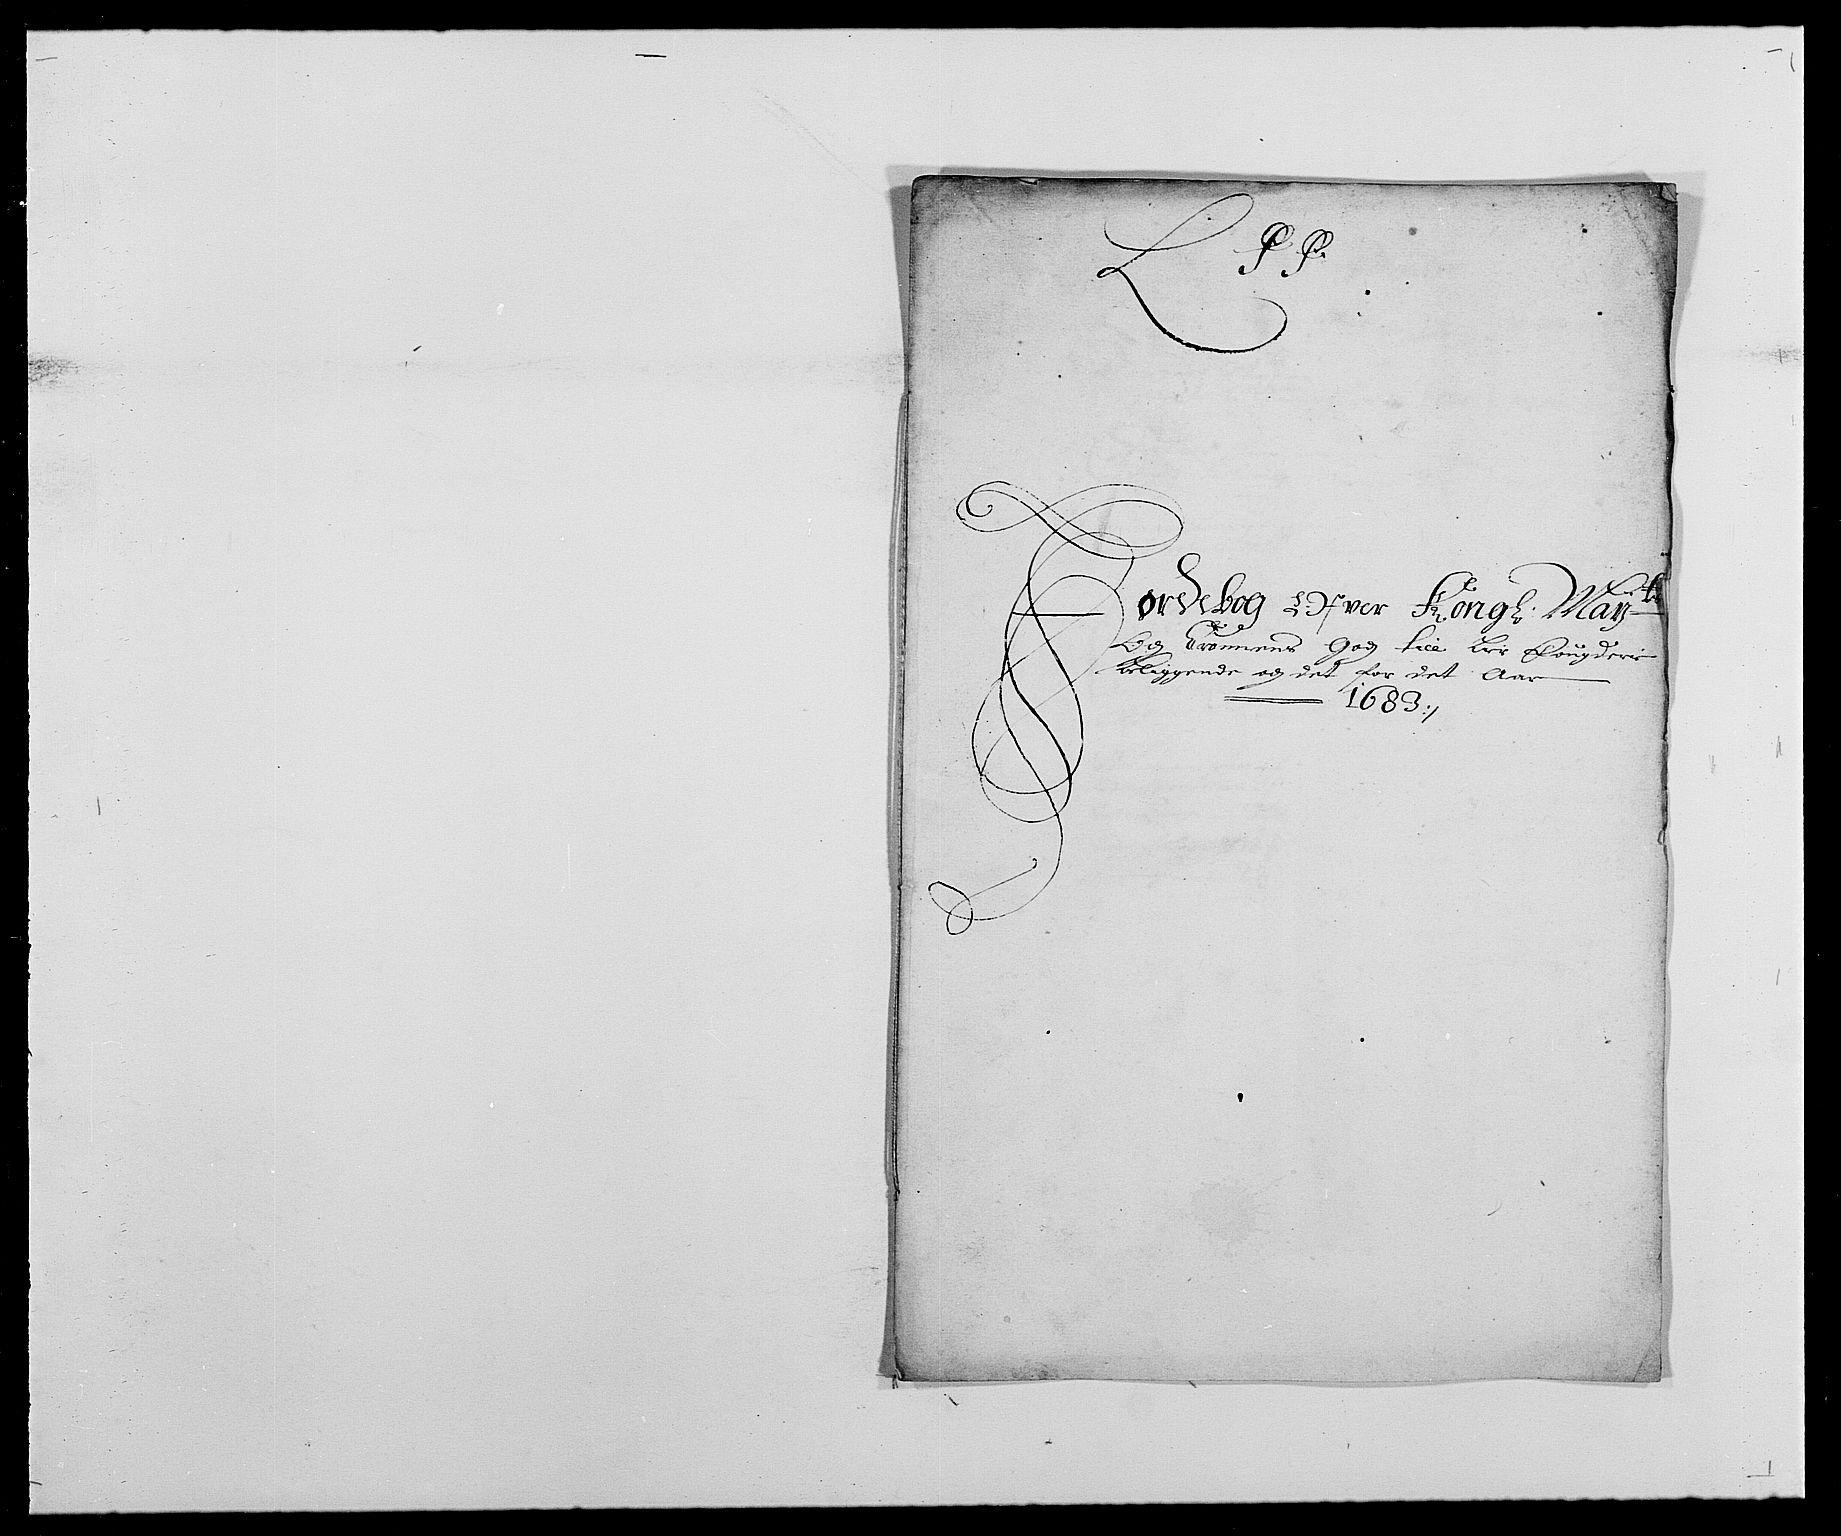 RA, Rentekammeret inntil 1814, Reviderte regnskaper, Fogderegnskap, R27/L1687: Fogderegnskap Lier, 1678-1686, s. 1